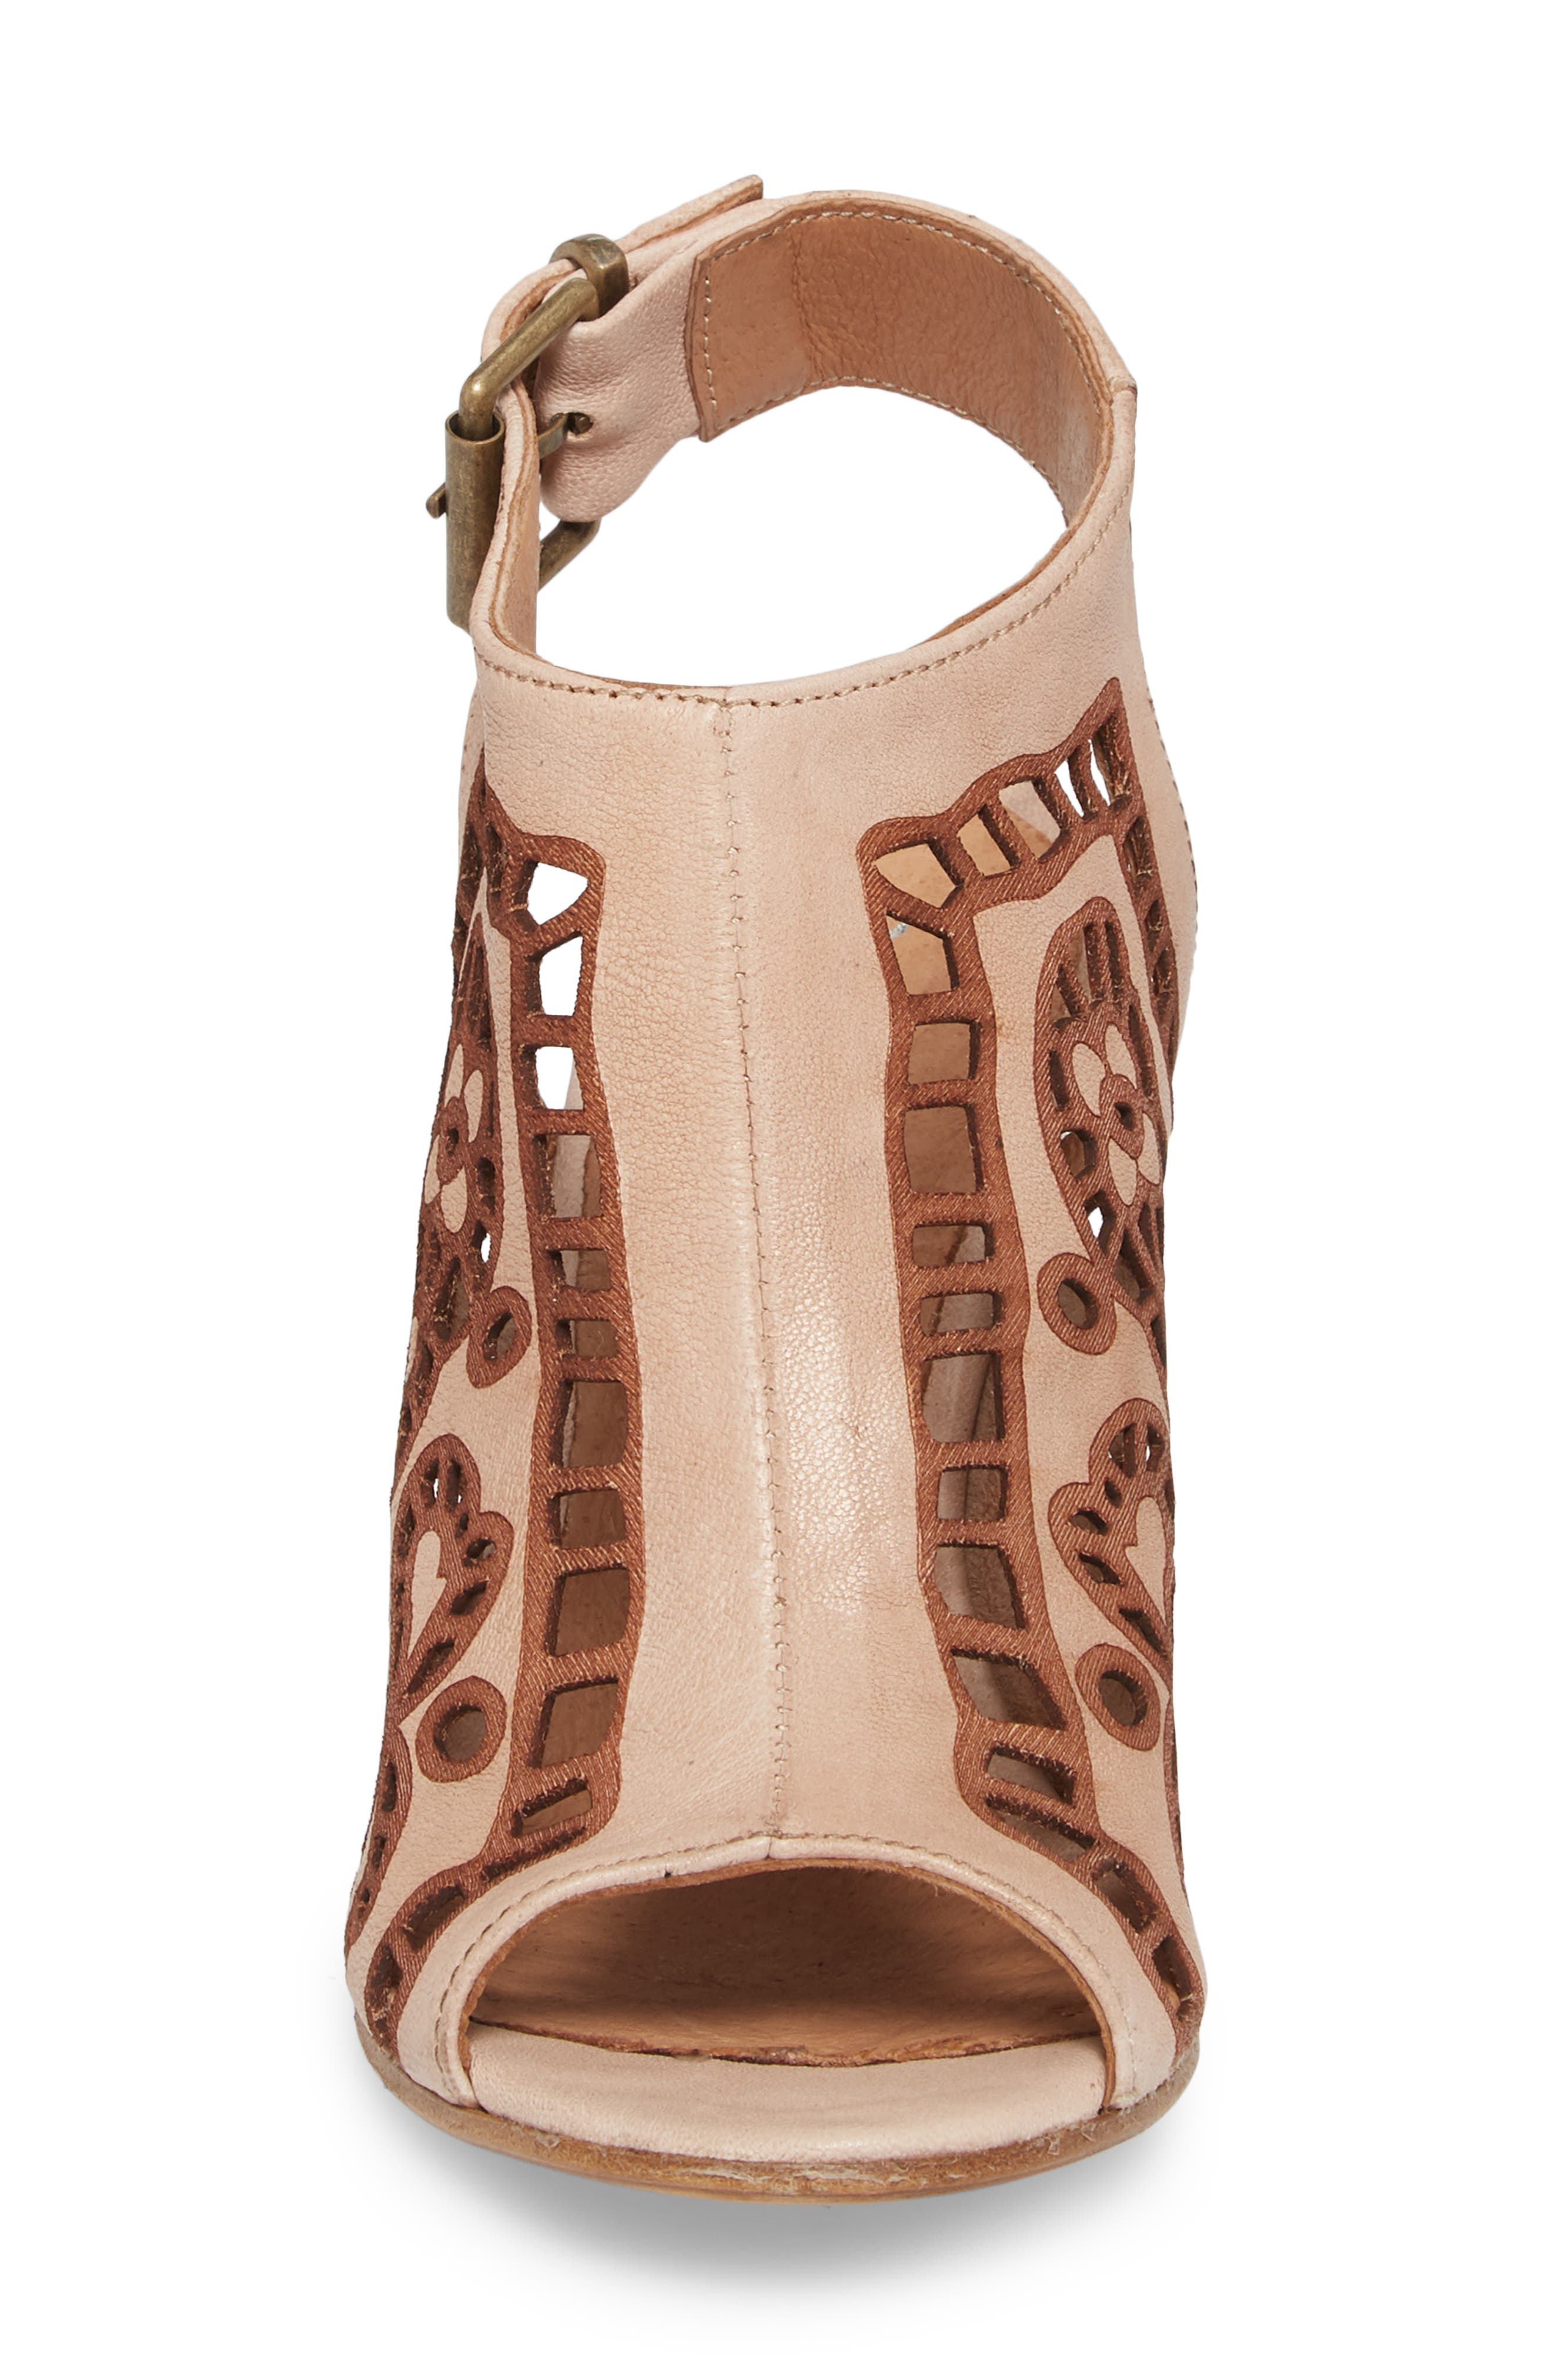 Sabrina Floral Cutout Shield Sandal,                             Alternate thumbnail 6, color,                             Blush Leather